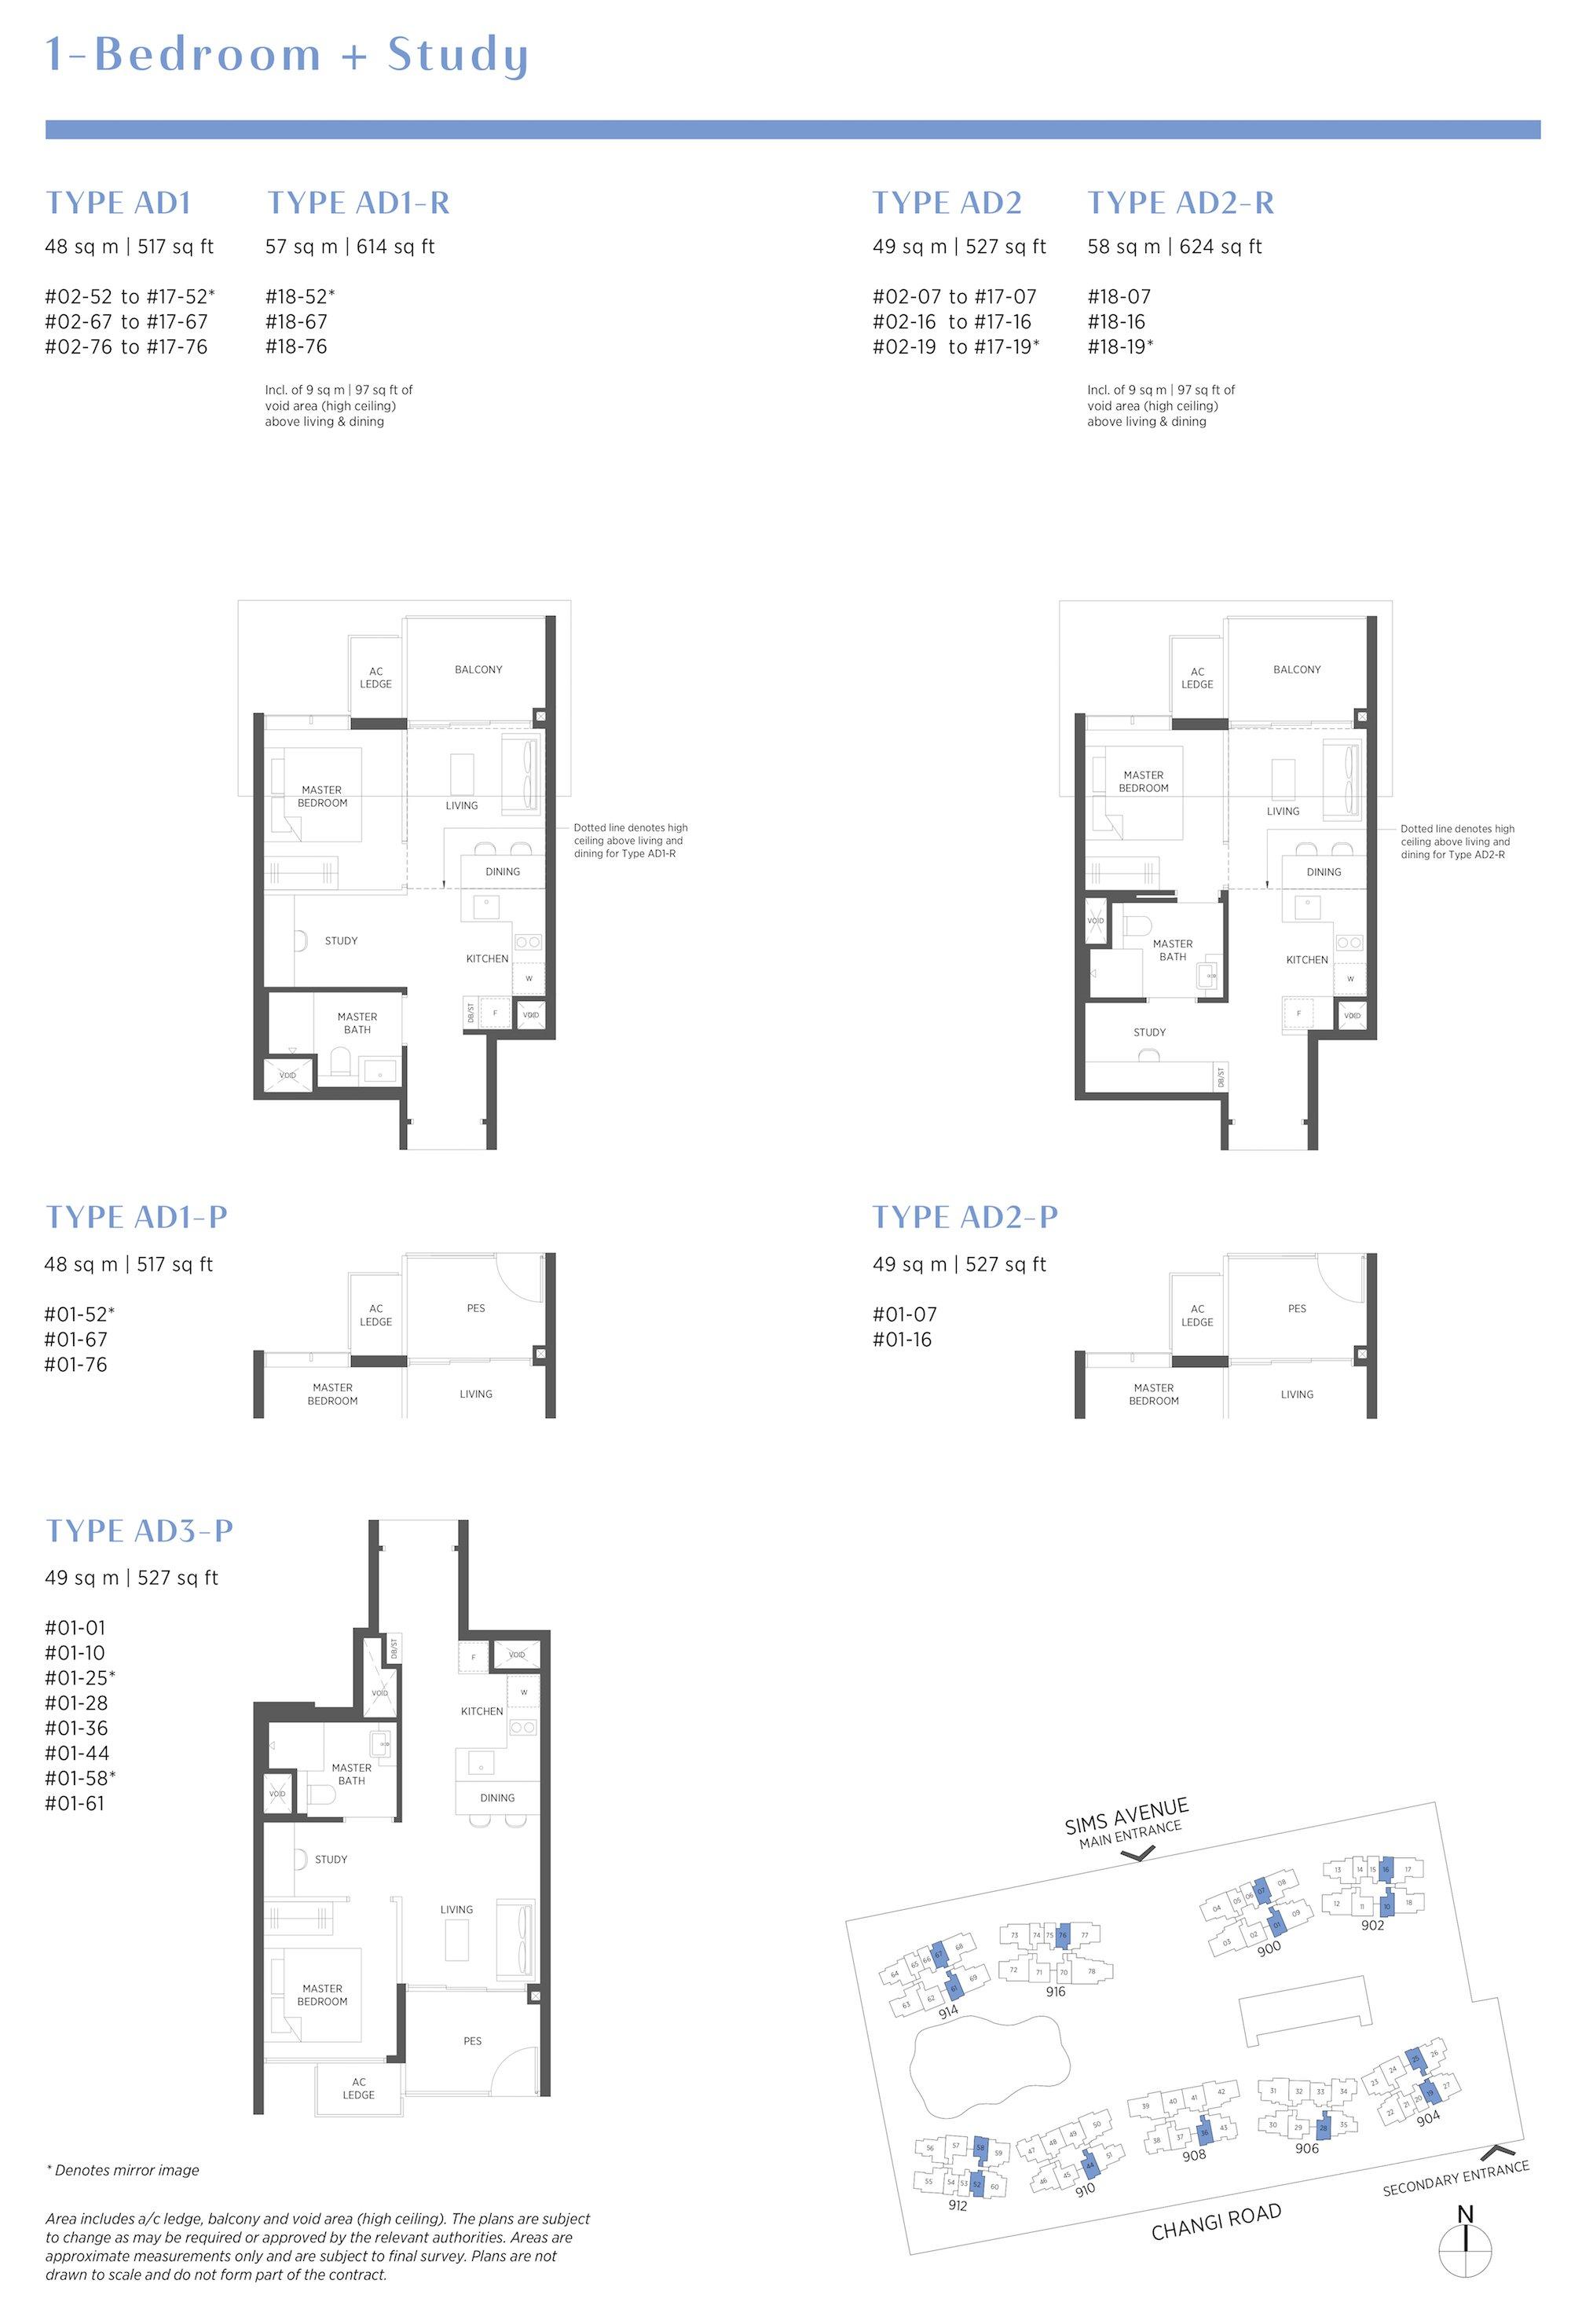 Parc Esta 东景苑 1 bedroom+study 1卧房+书房 AD1 AD2